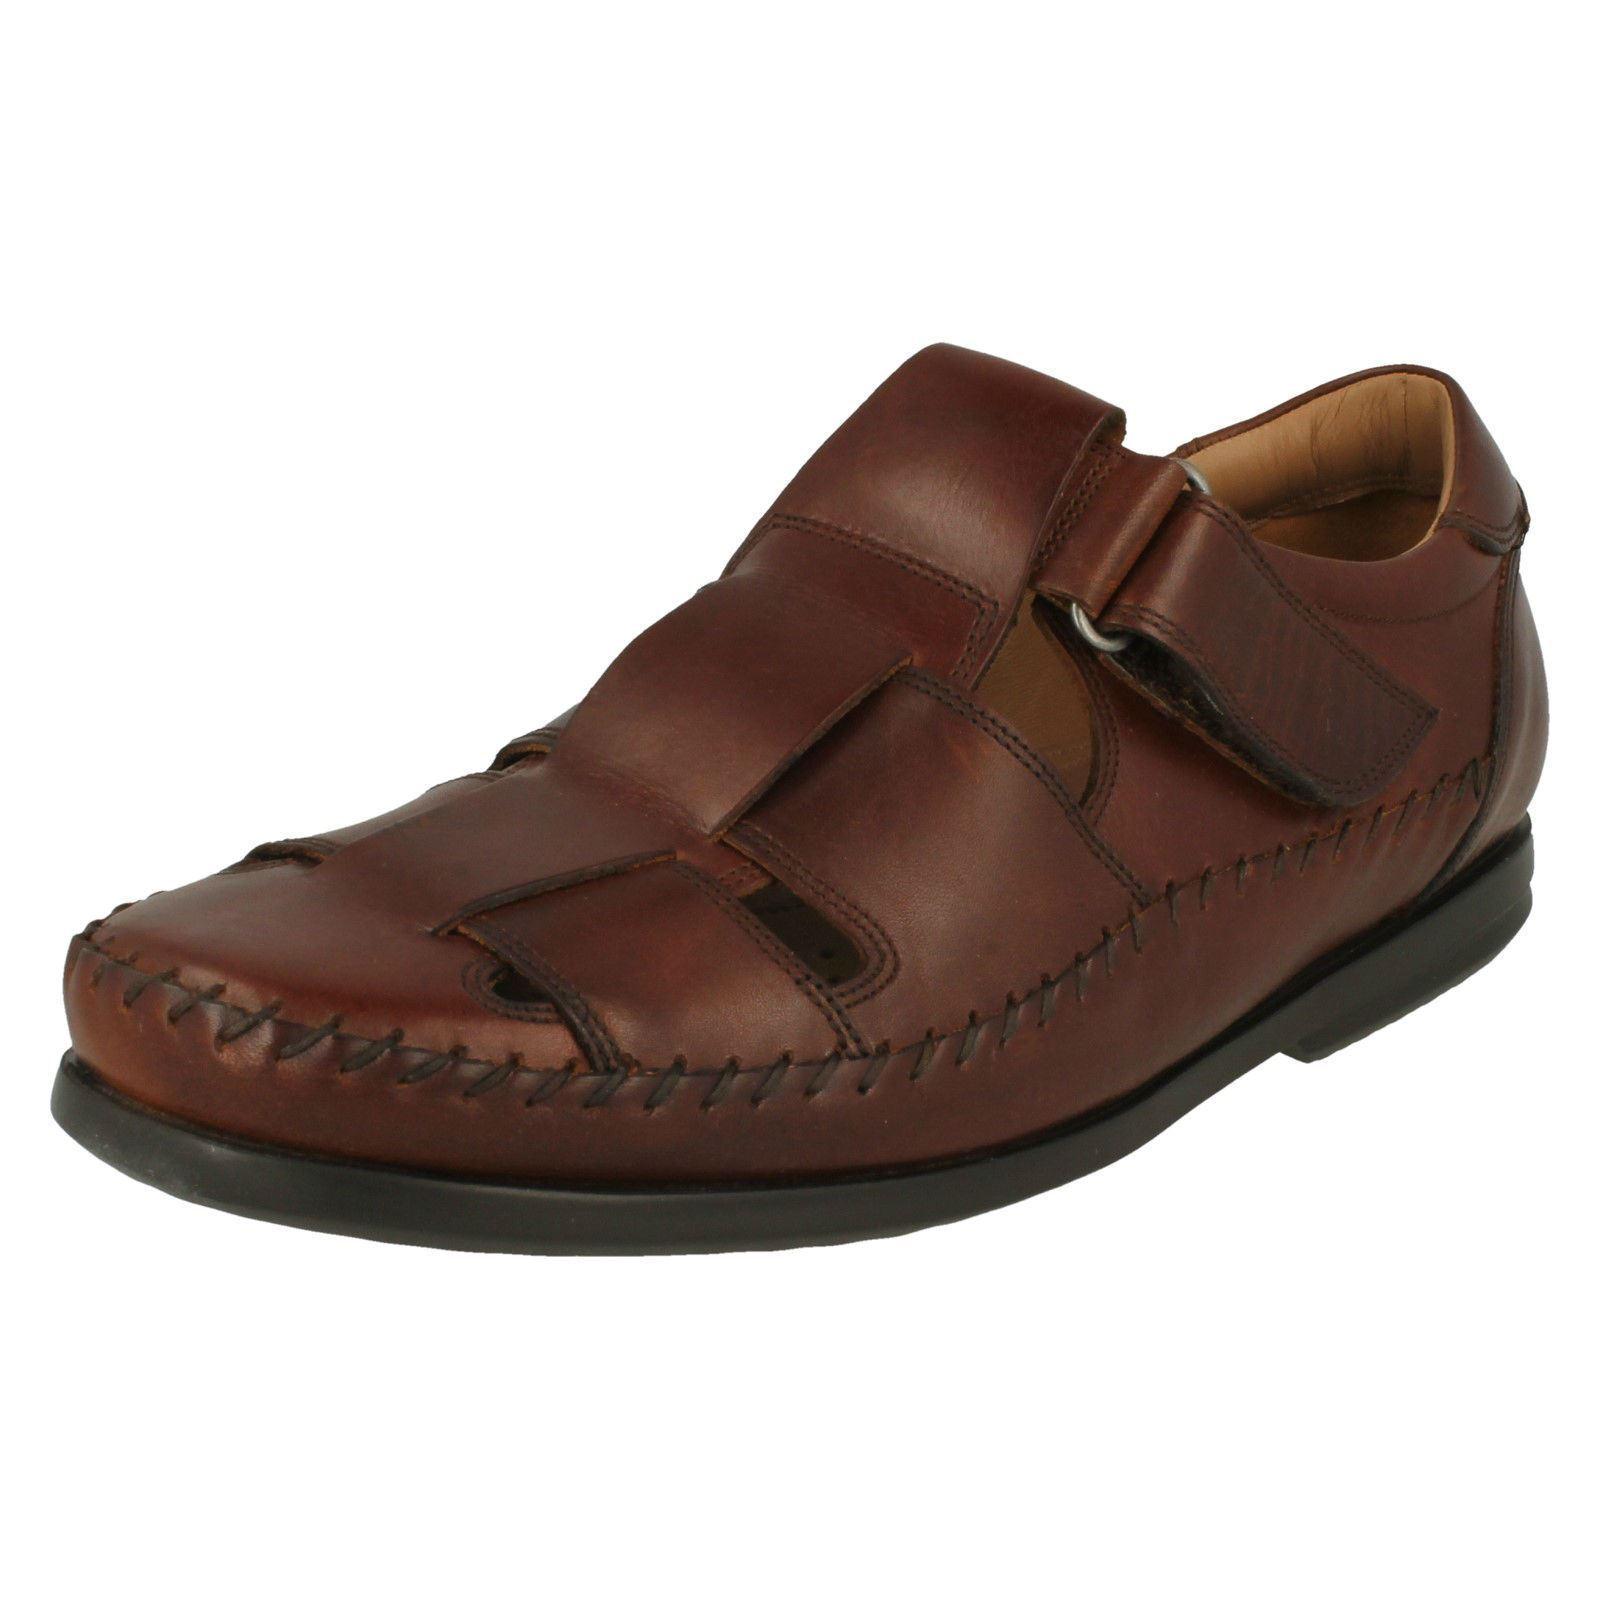 herren Clerchen Un Gala Strap Casual Strapped Sandals